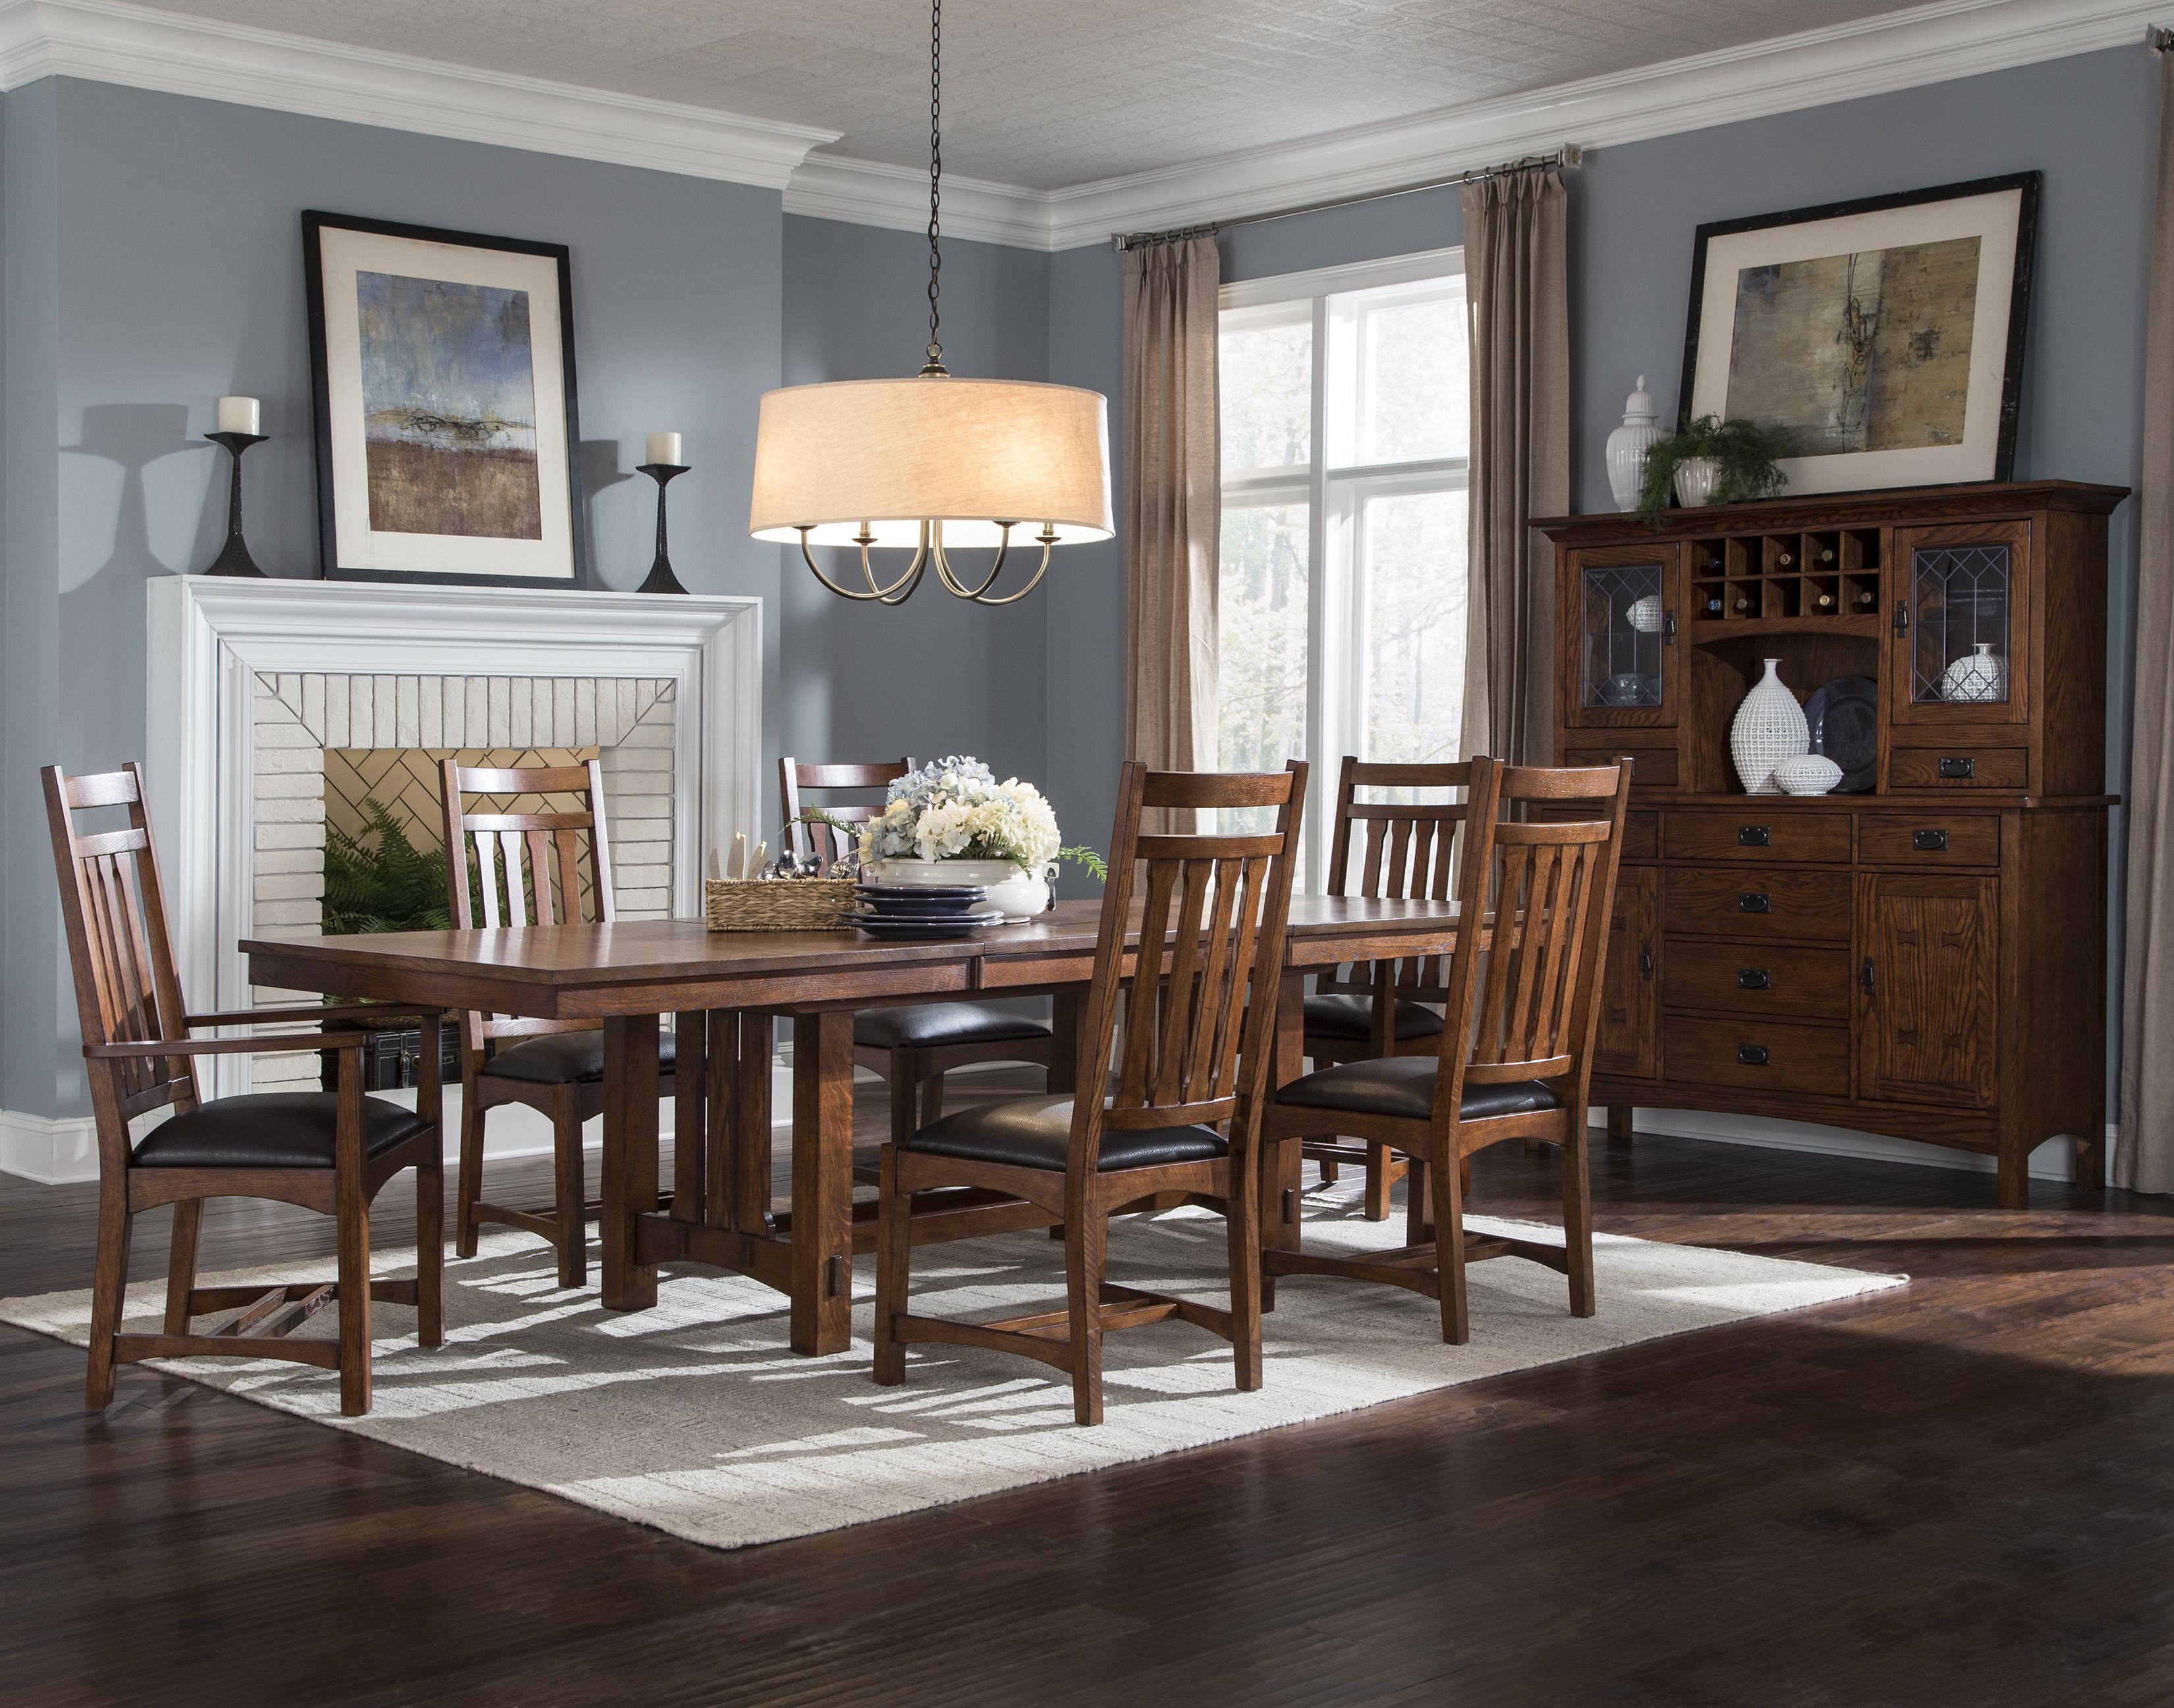 Intercon Oak Park Formal Dining Room Group - Item Number: OP Dining Room Group 1